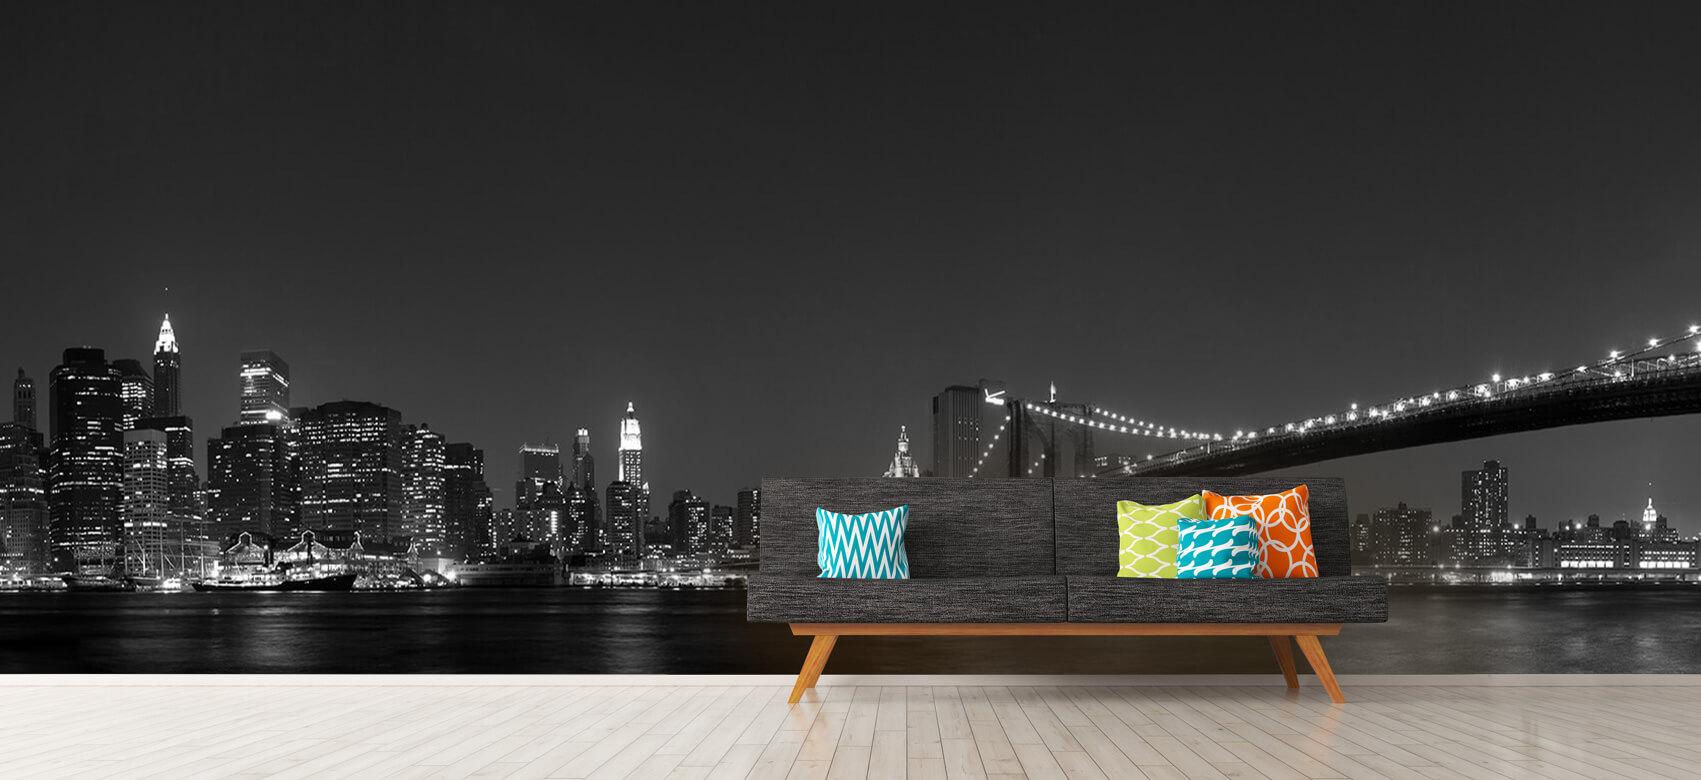 Nacht Manhattan Skyline and Brooklyn Bridge 13